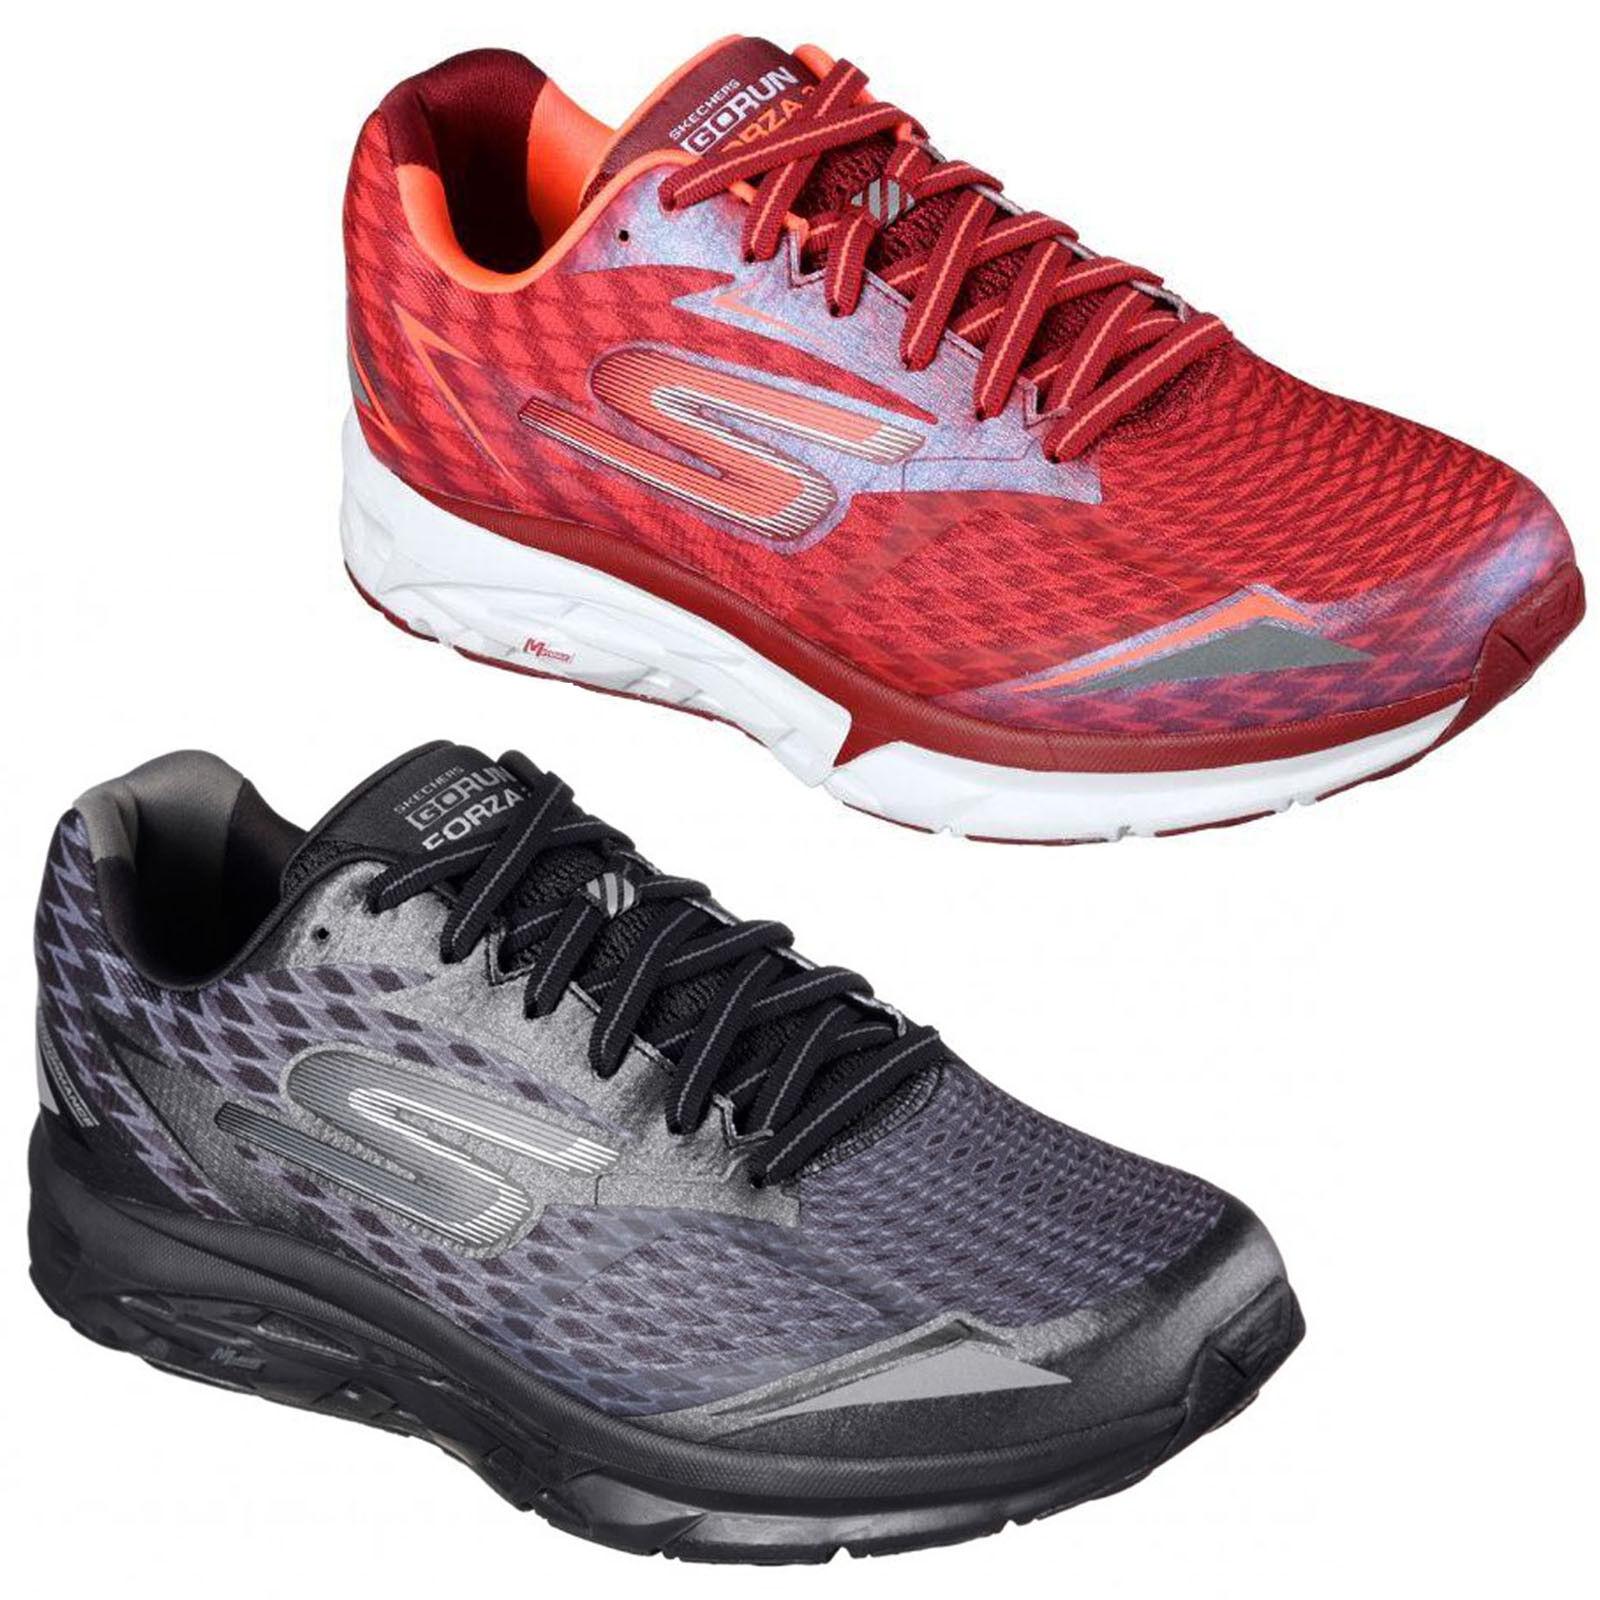 8b5bea170167 Details about Skechers GoRun Forza 2 Trainers Mens Sports Running Memory  Foam Training Shoes